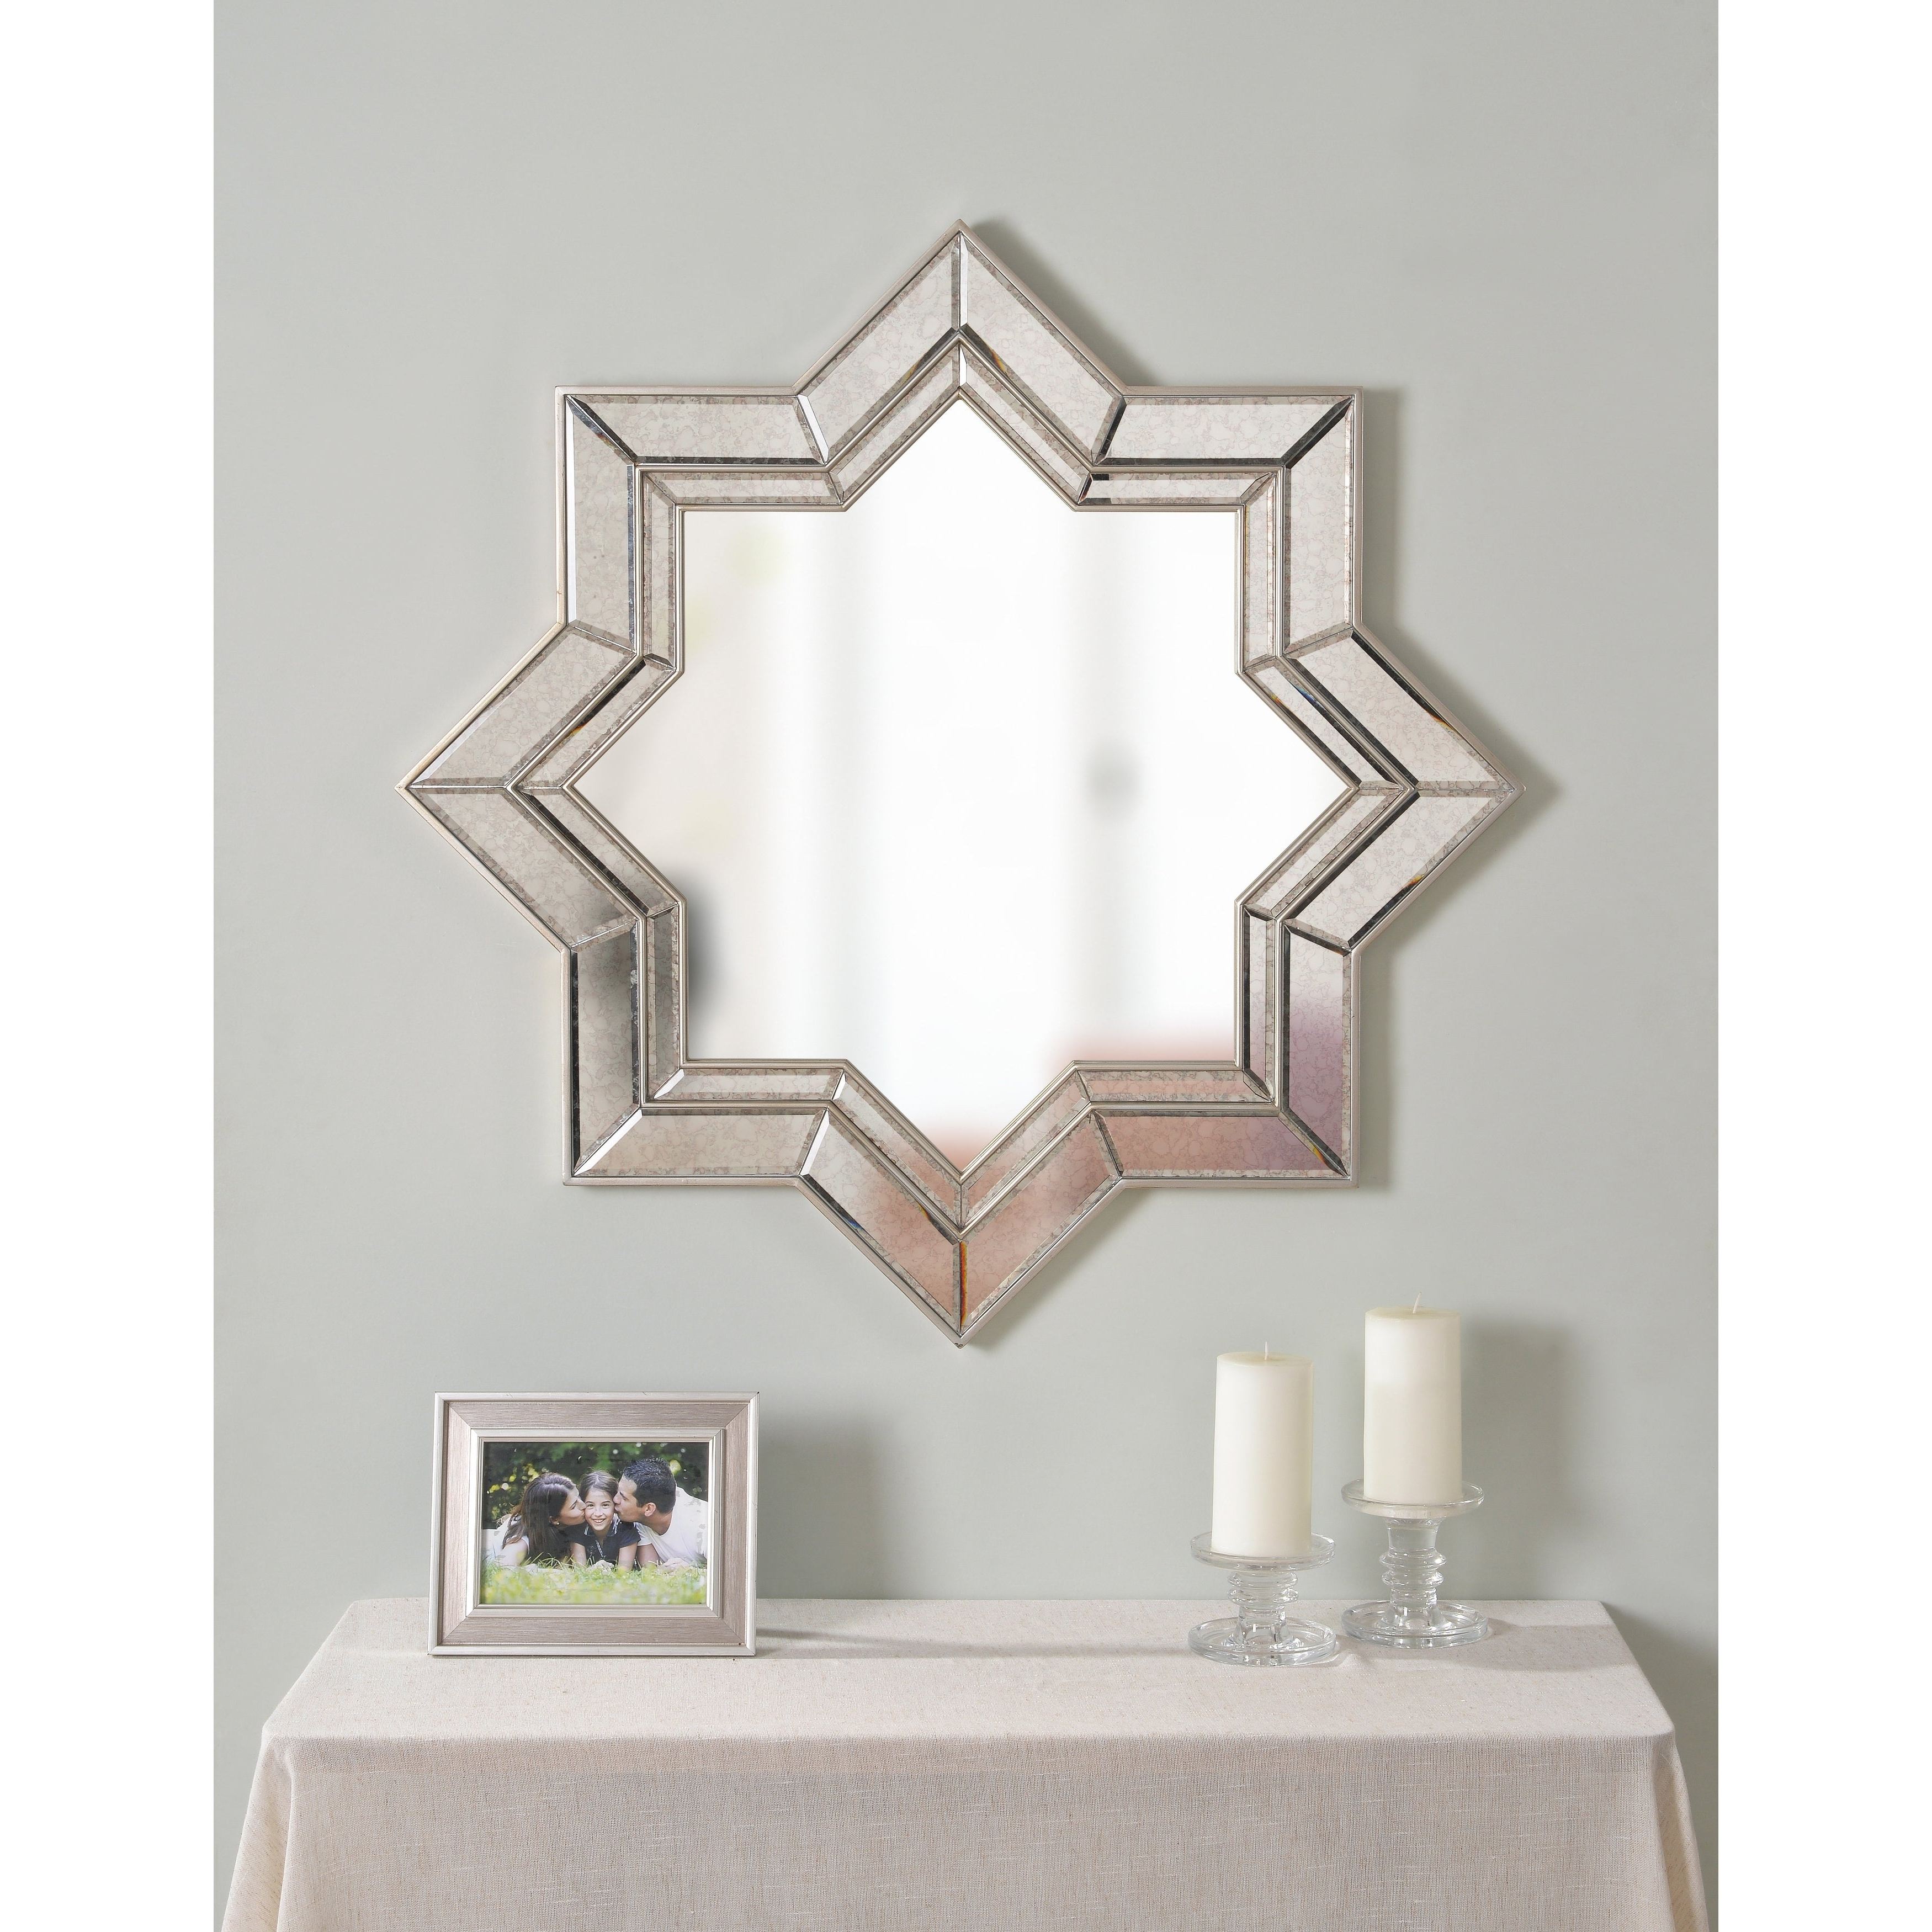 "Favorite Kai 35"" Champagne Geometric Wall Mirror Intended For Geometric Wall Mirrors (View 17 of 20)"